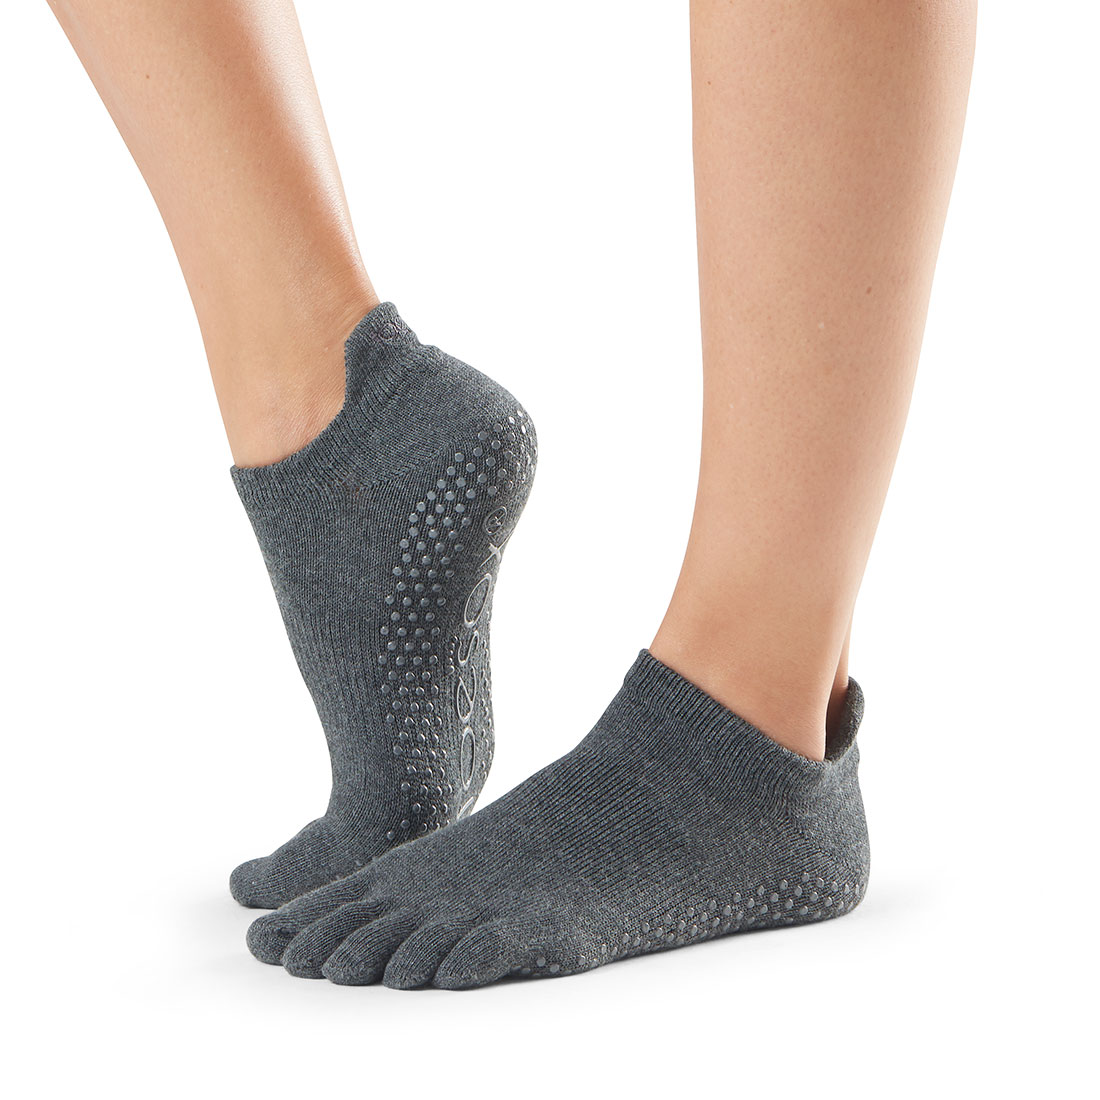 Yogasocken ToeSox Low Rise Full Toe Charcoal Grey